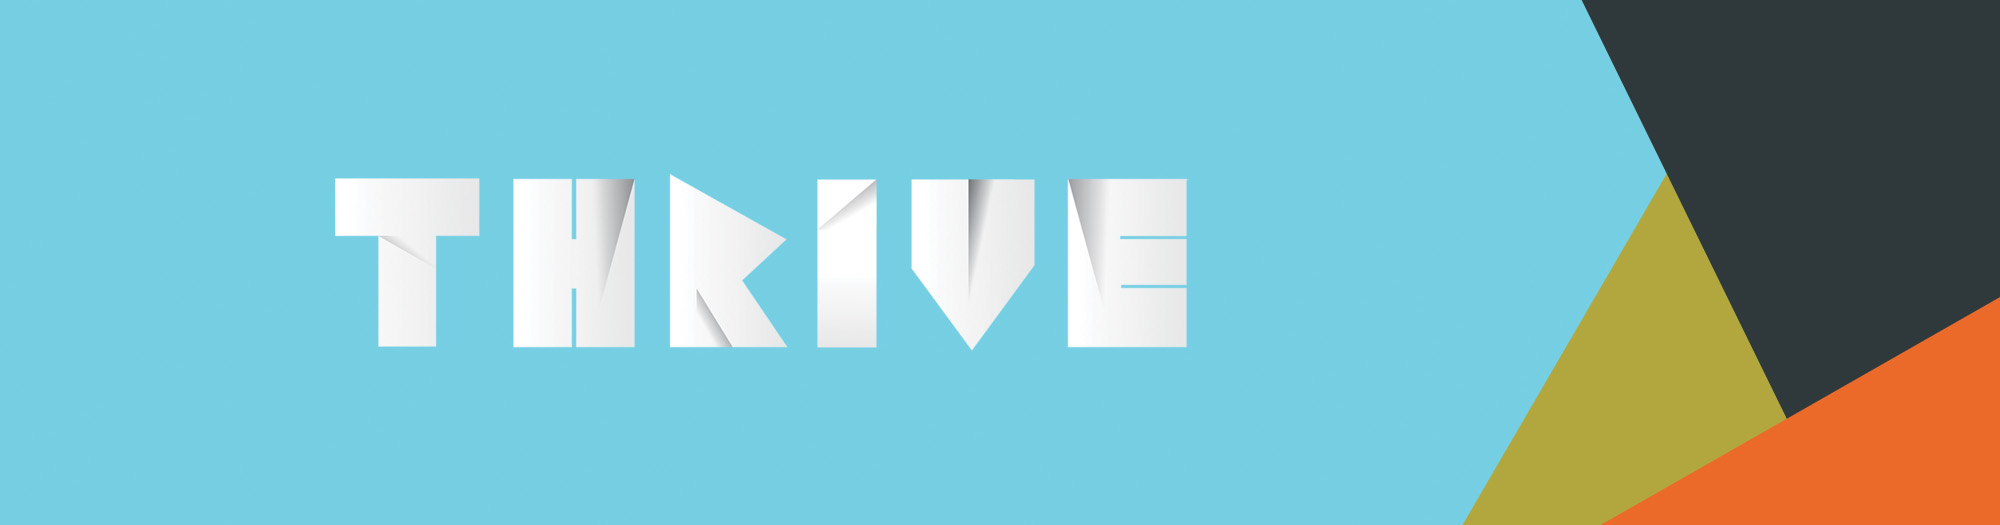 Thrive - Web Header (2000x525)